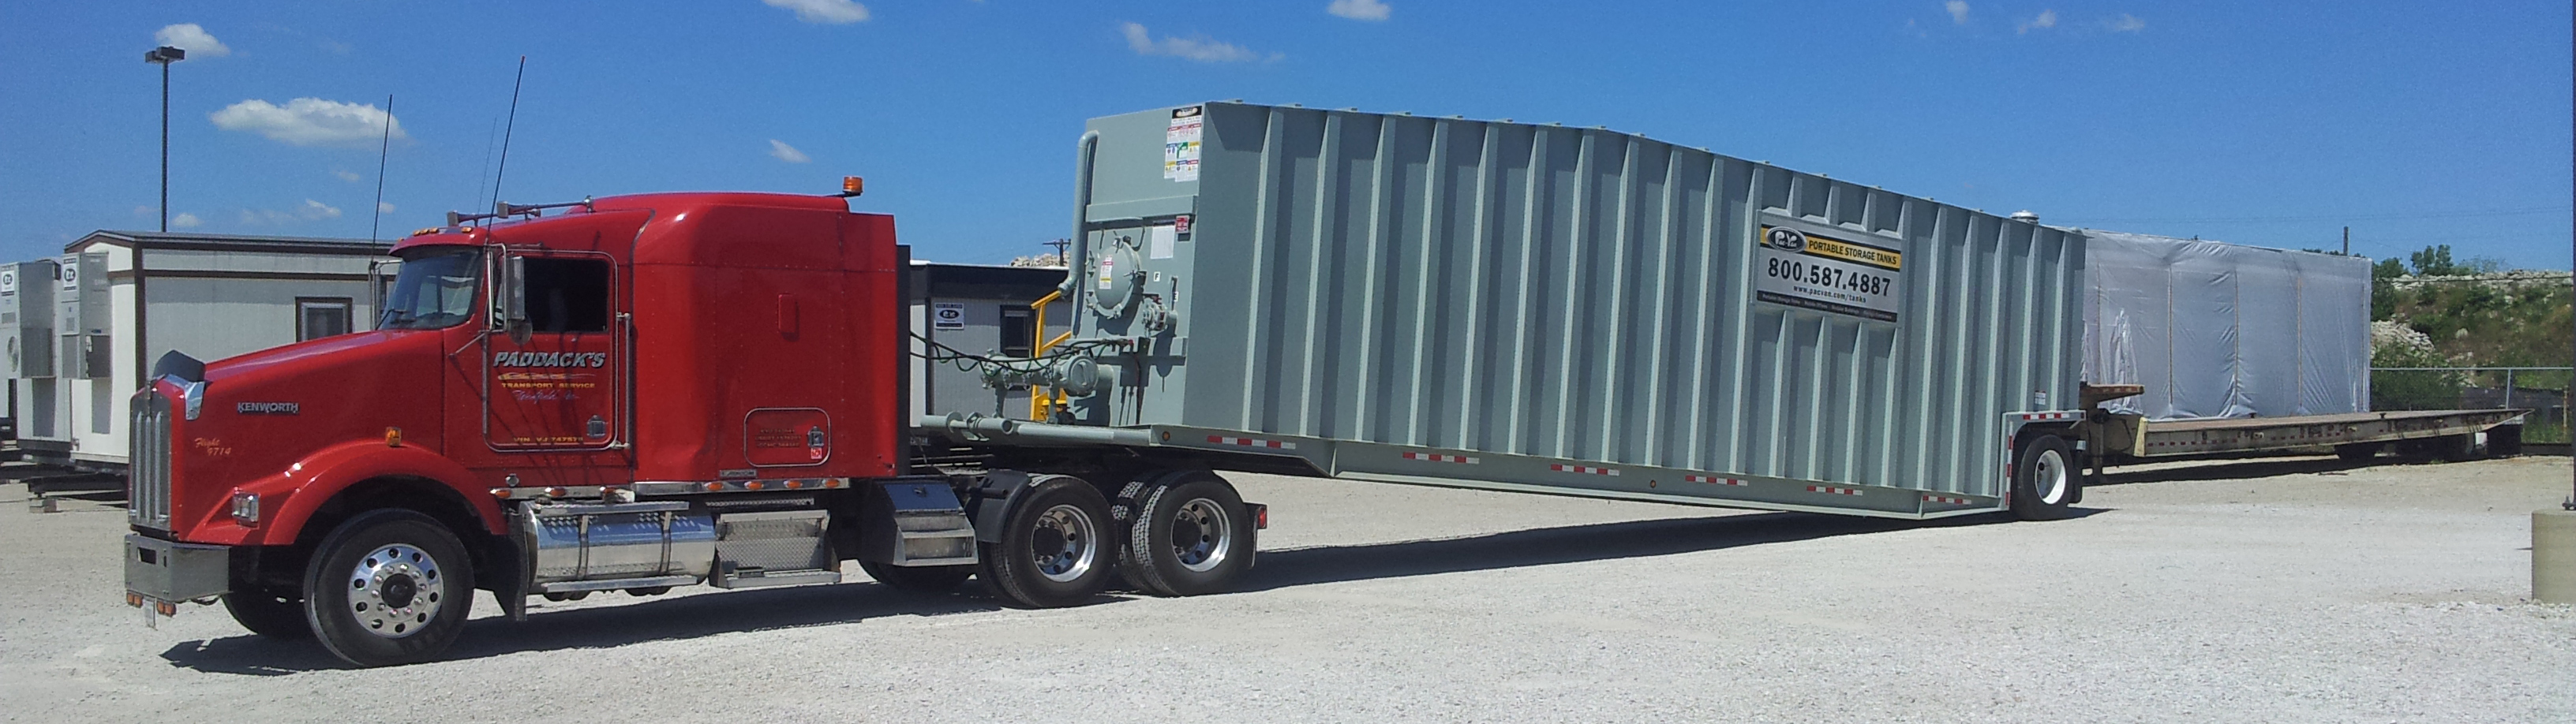 Portable Storage Tank